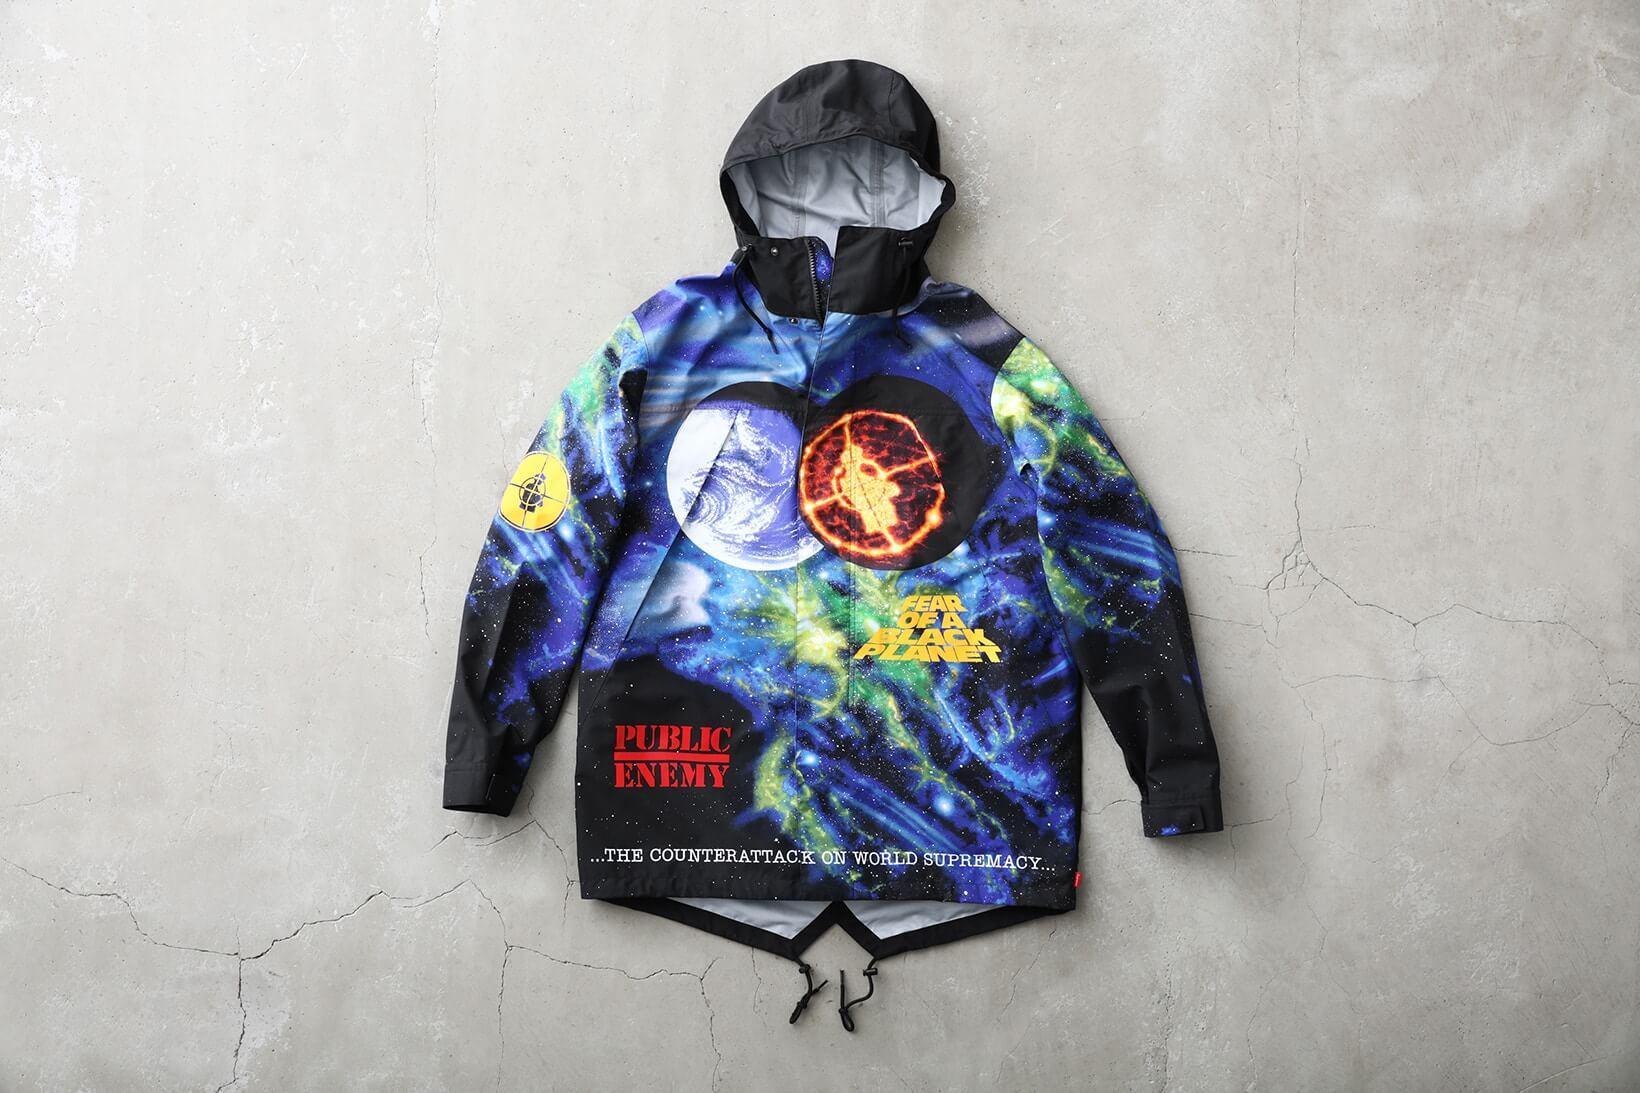 Supreme x UNDERCOVER + Public Enemy 2018. Fotografía: Supreme